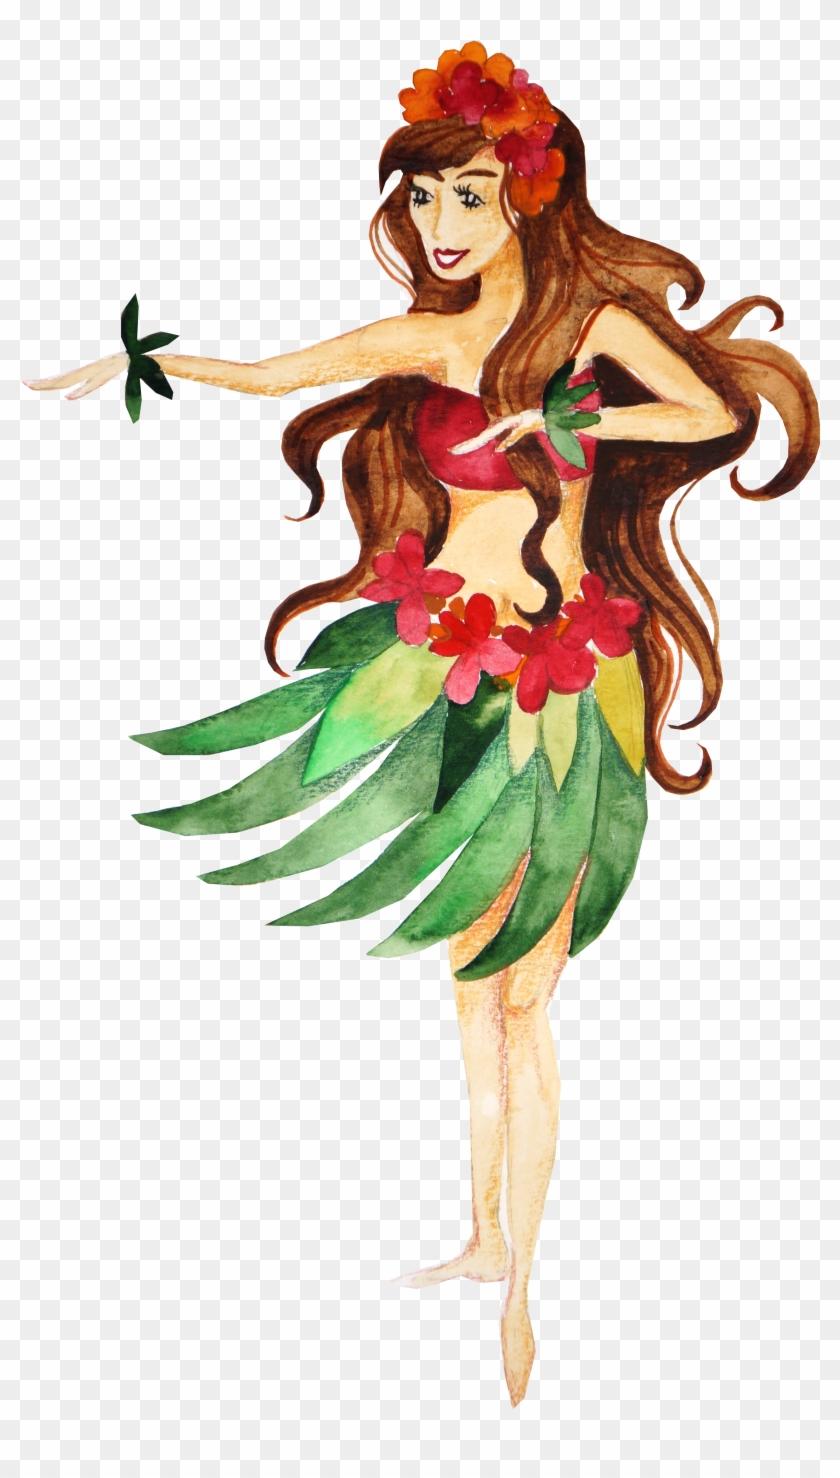 Hawaii Hula Dance - Secretly Designed 'aloha Dancer On The Beach' Graphic #358621